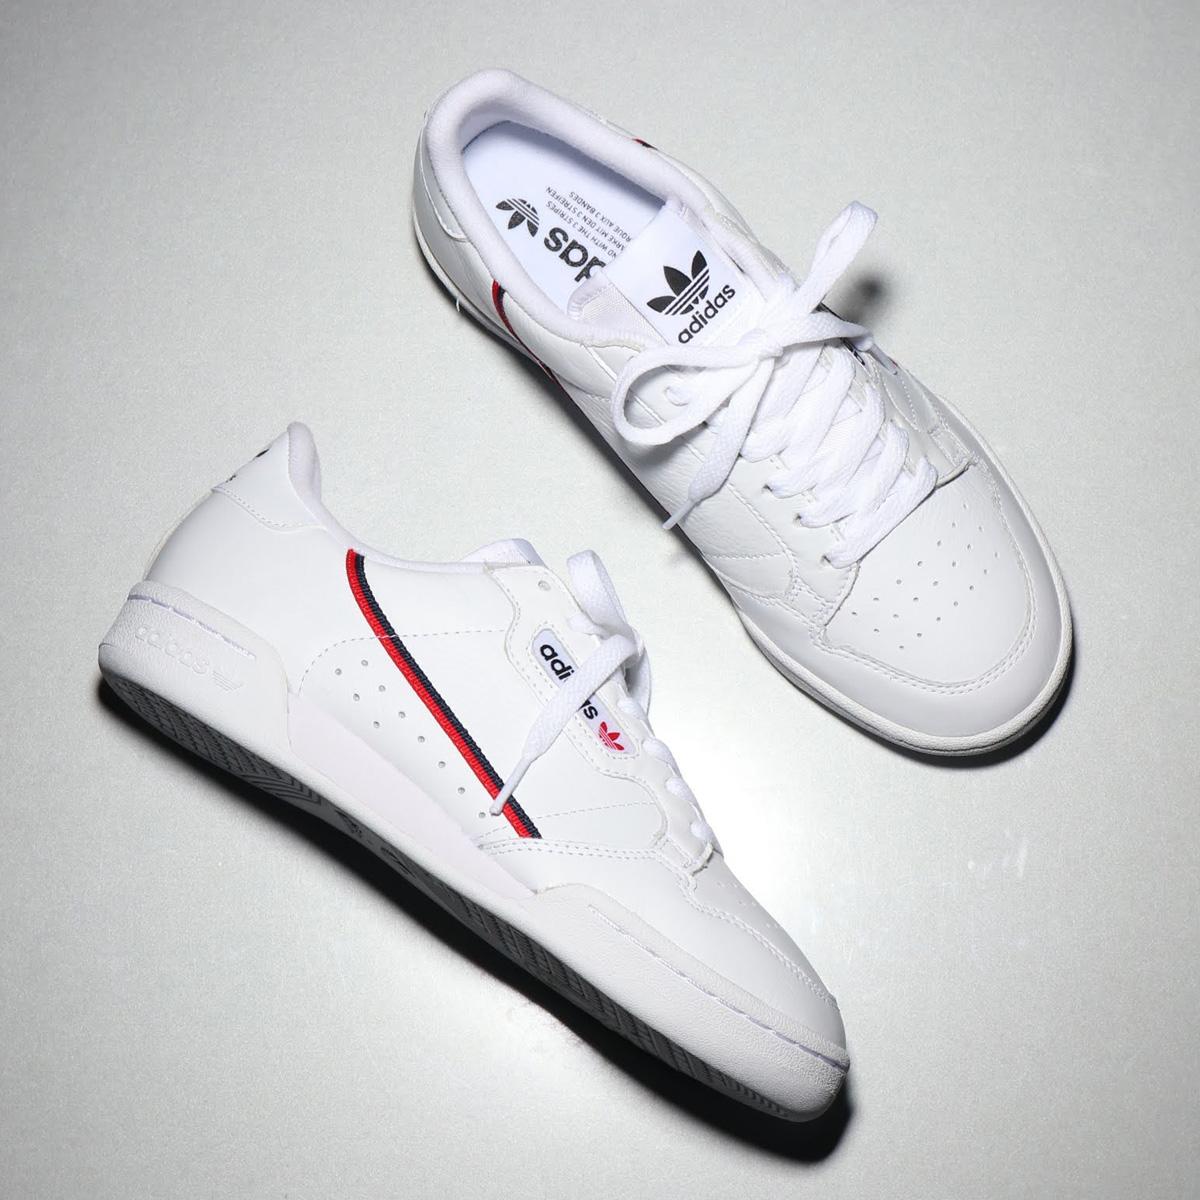 adidas Originals CONTINENTAL 80(アディダス オリジナルス コンチネンタル 80)FTWR WHITE/SCARLET/COLLEGIATE NAVY【メンズ レディース スニーカー】18FW-I